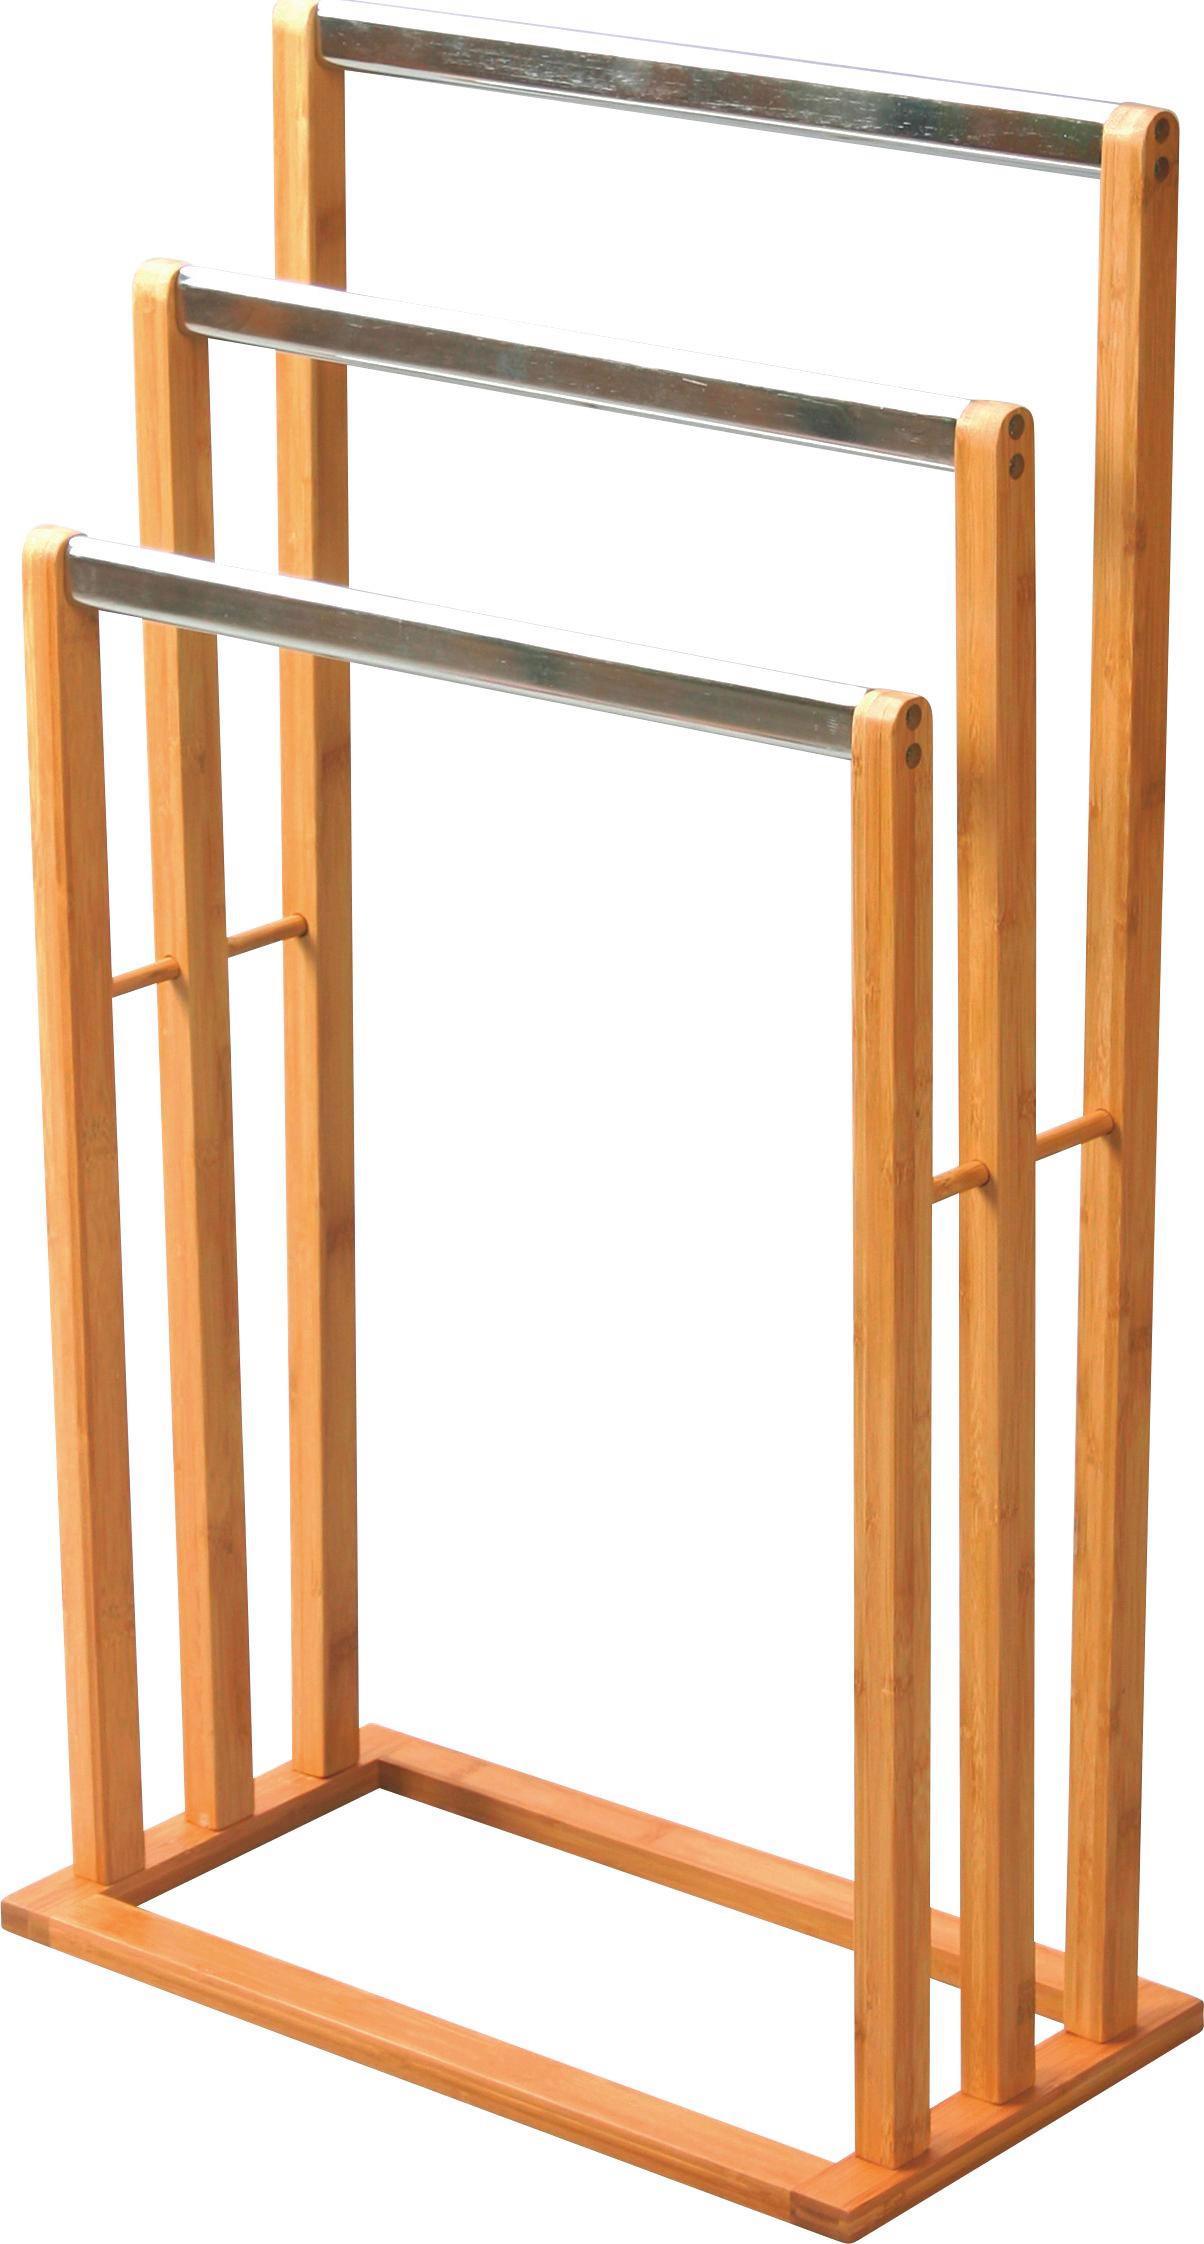 Držač Ručnika Držač Ručnika - boje oplemenjenog čelika/natur boje, Moderno, drvo/metal (46,5/82/24,5cm)